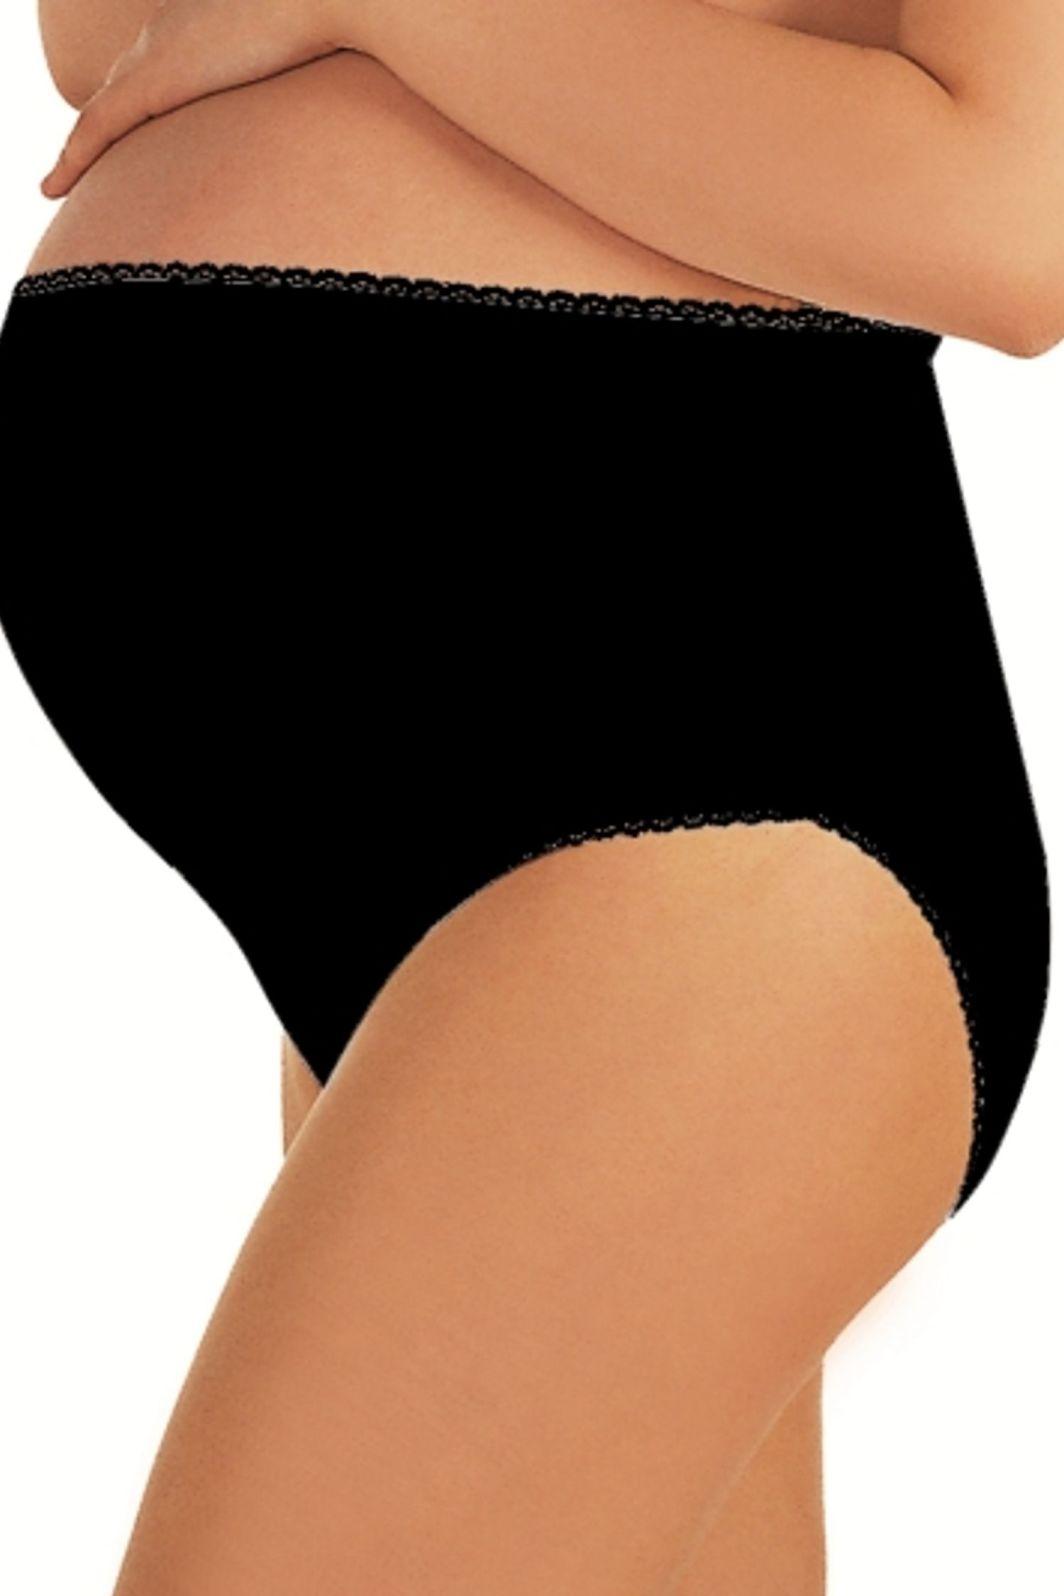 Italian fashion Majtki ciążowe Mama Maxi czarne XL 1